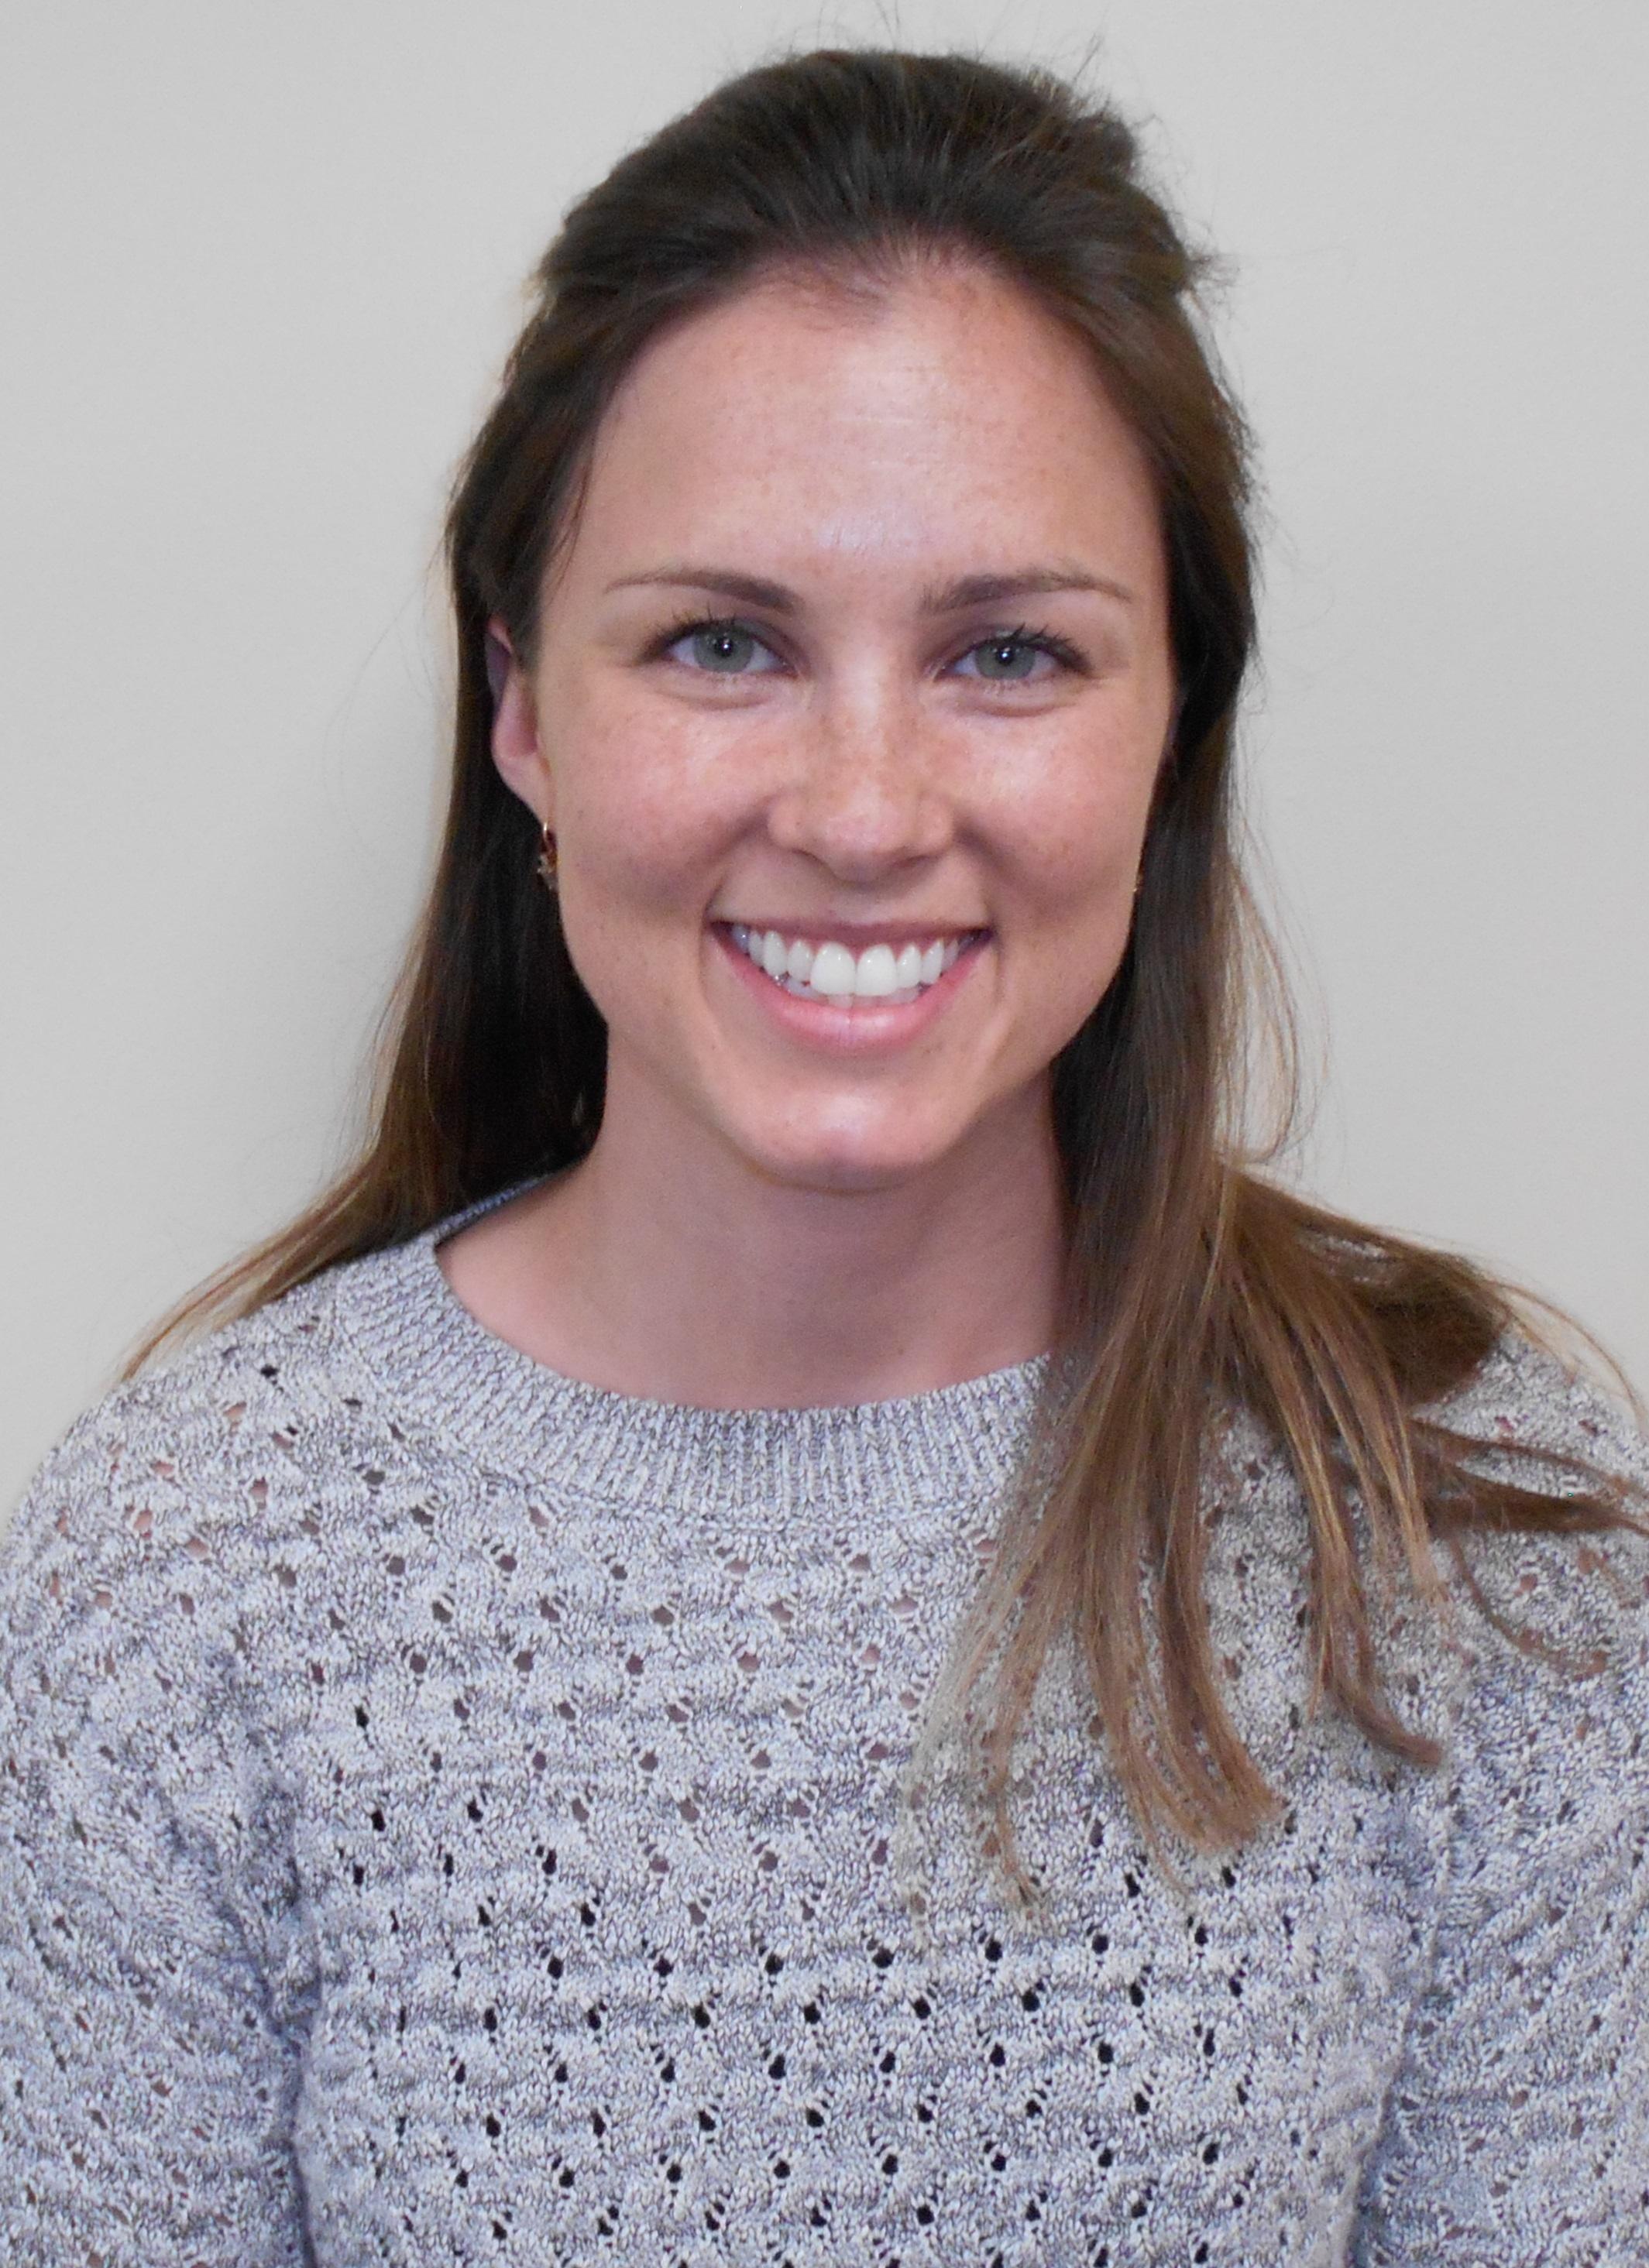 Katelyn Larsson